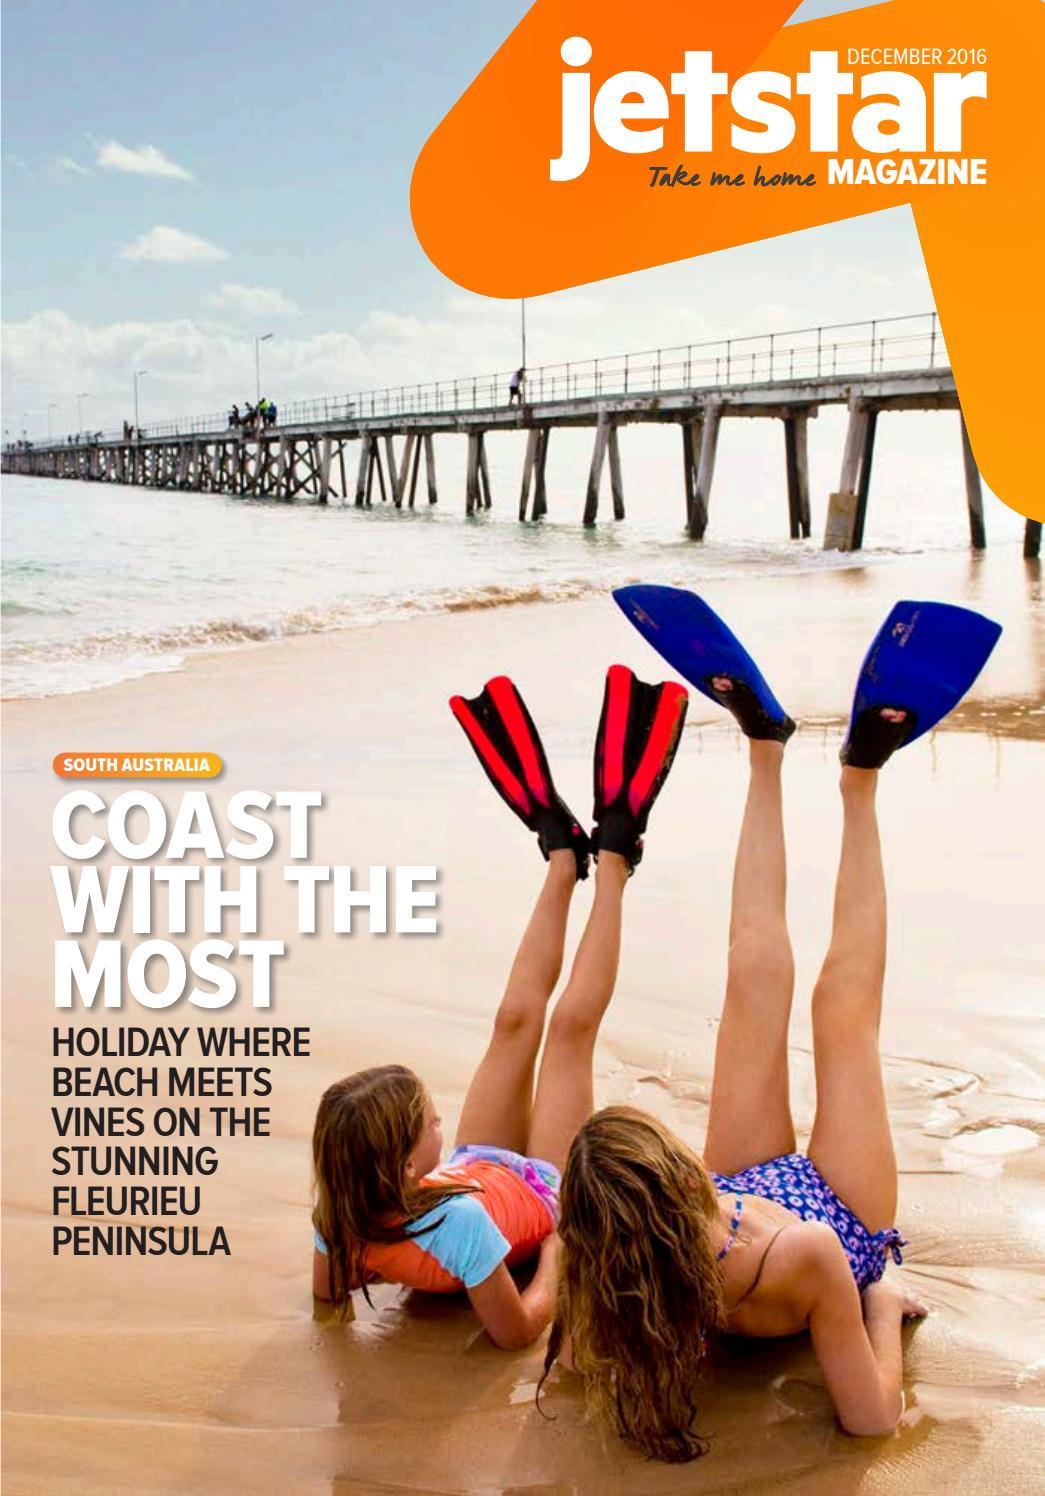 462143456 Jetstar December Magazine by HGM - issuu